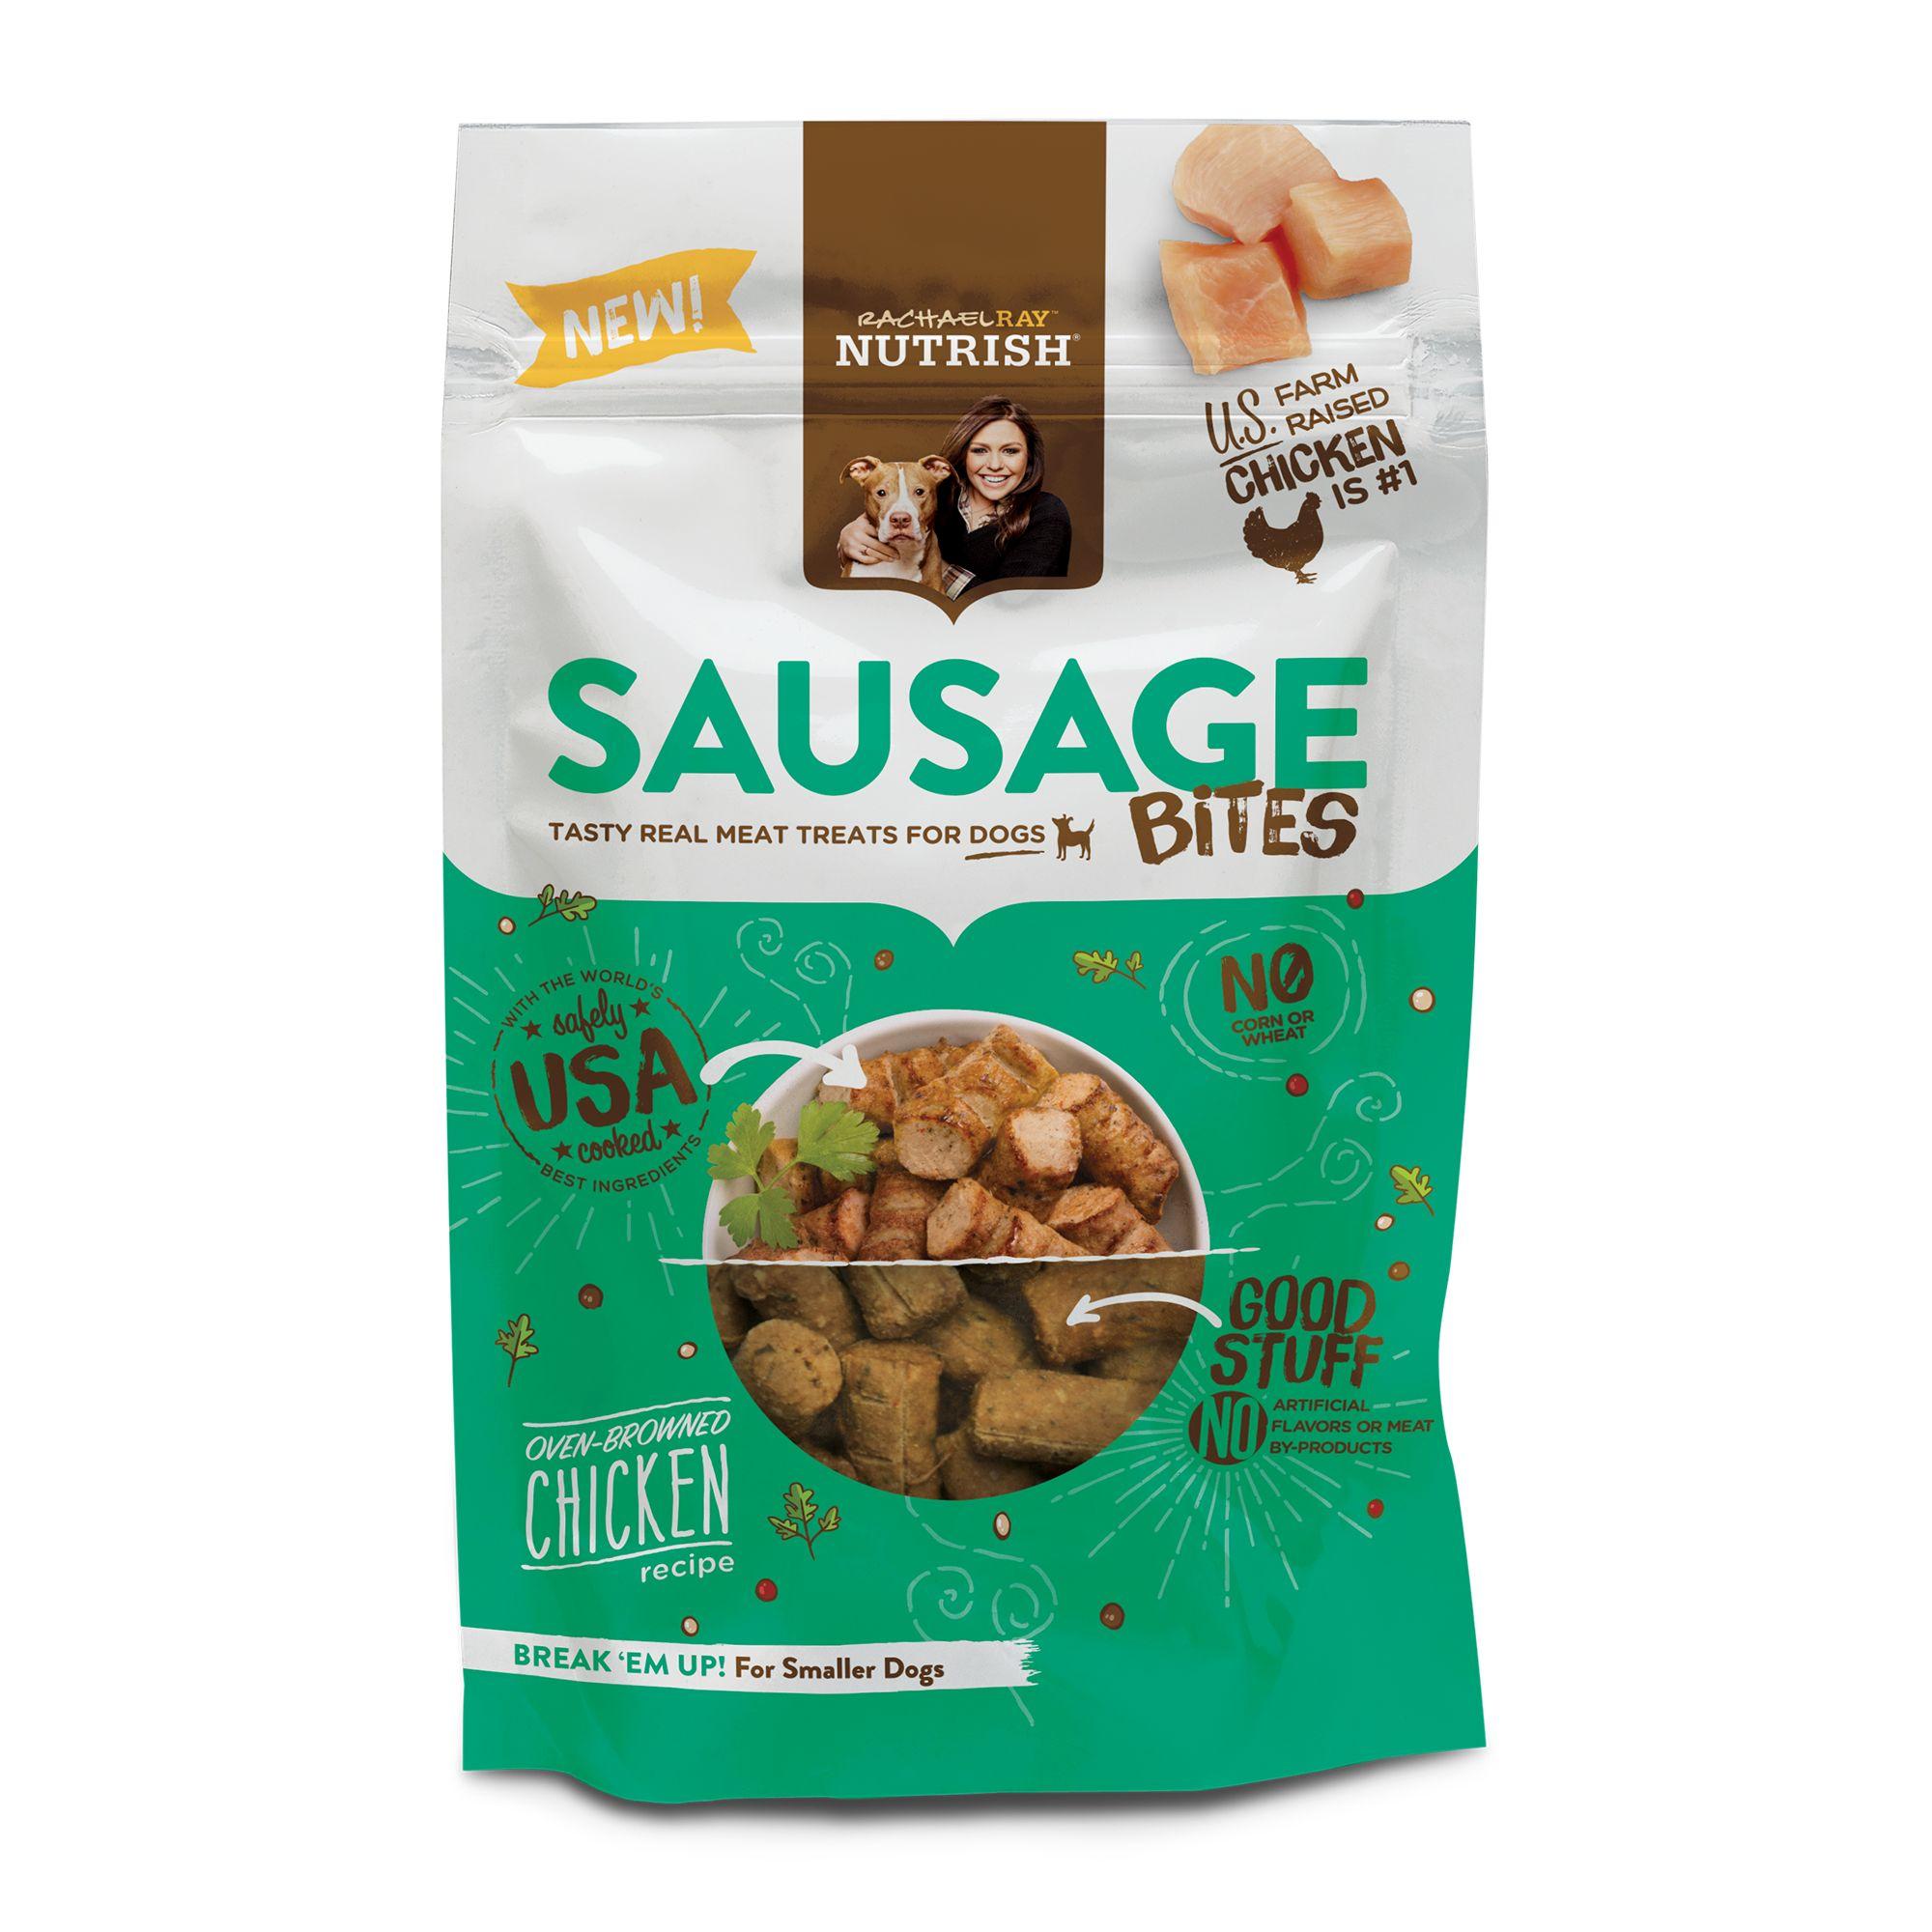 Rachael Ray, Nutrish Sausage Bites Dog Treat - Chicken Recipe size: 3 Oz, Rachael Ray Nutrish 5278098